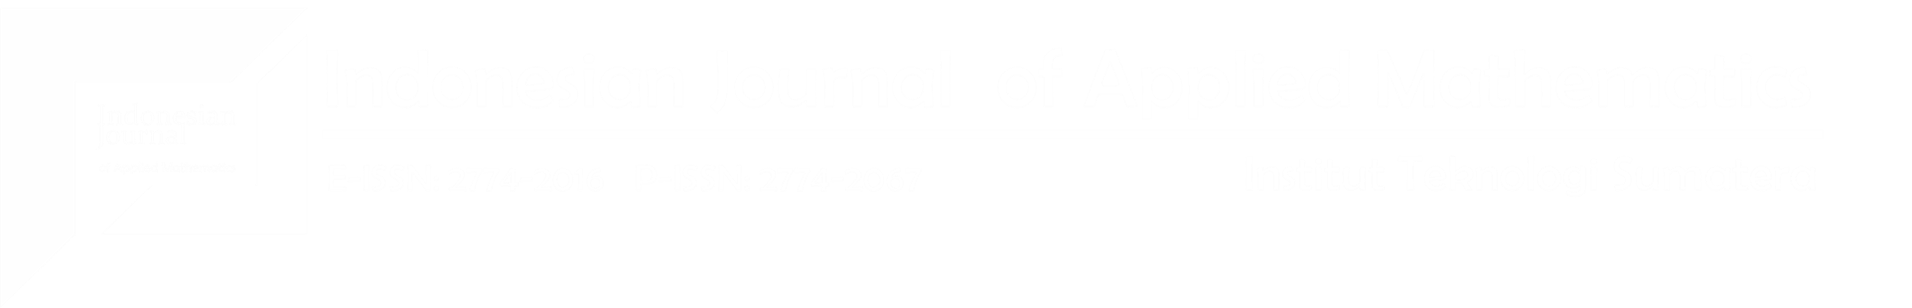 logo_indojam_2021